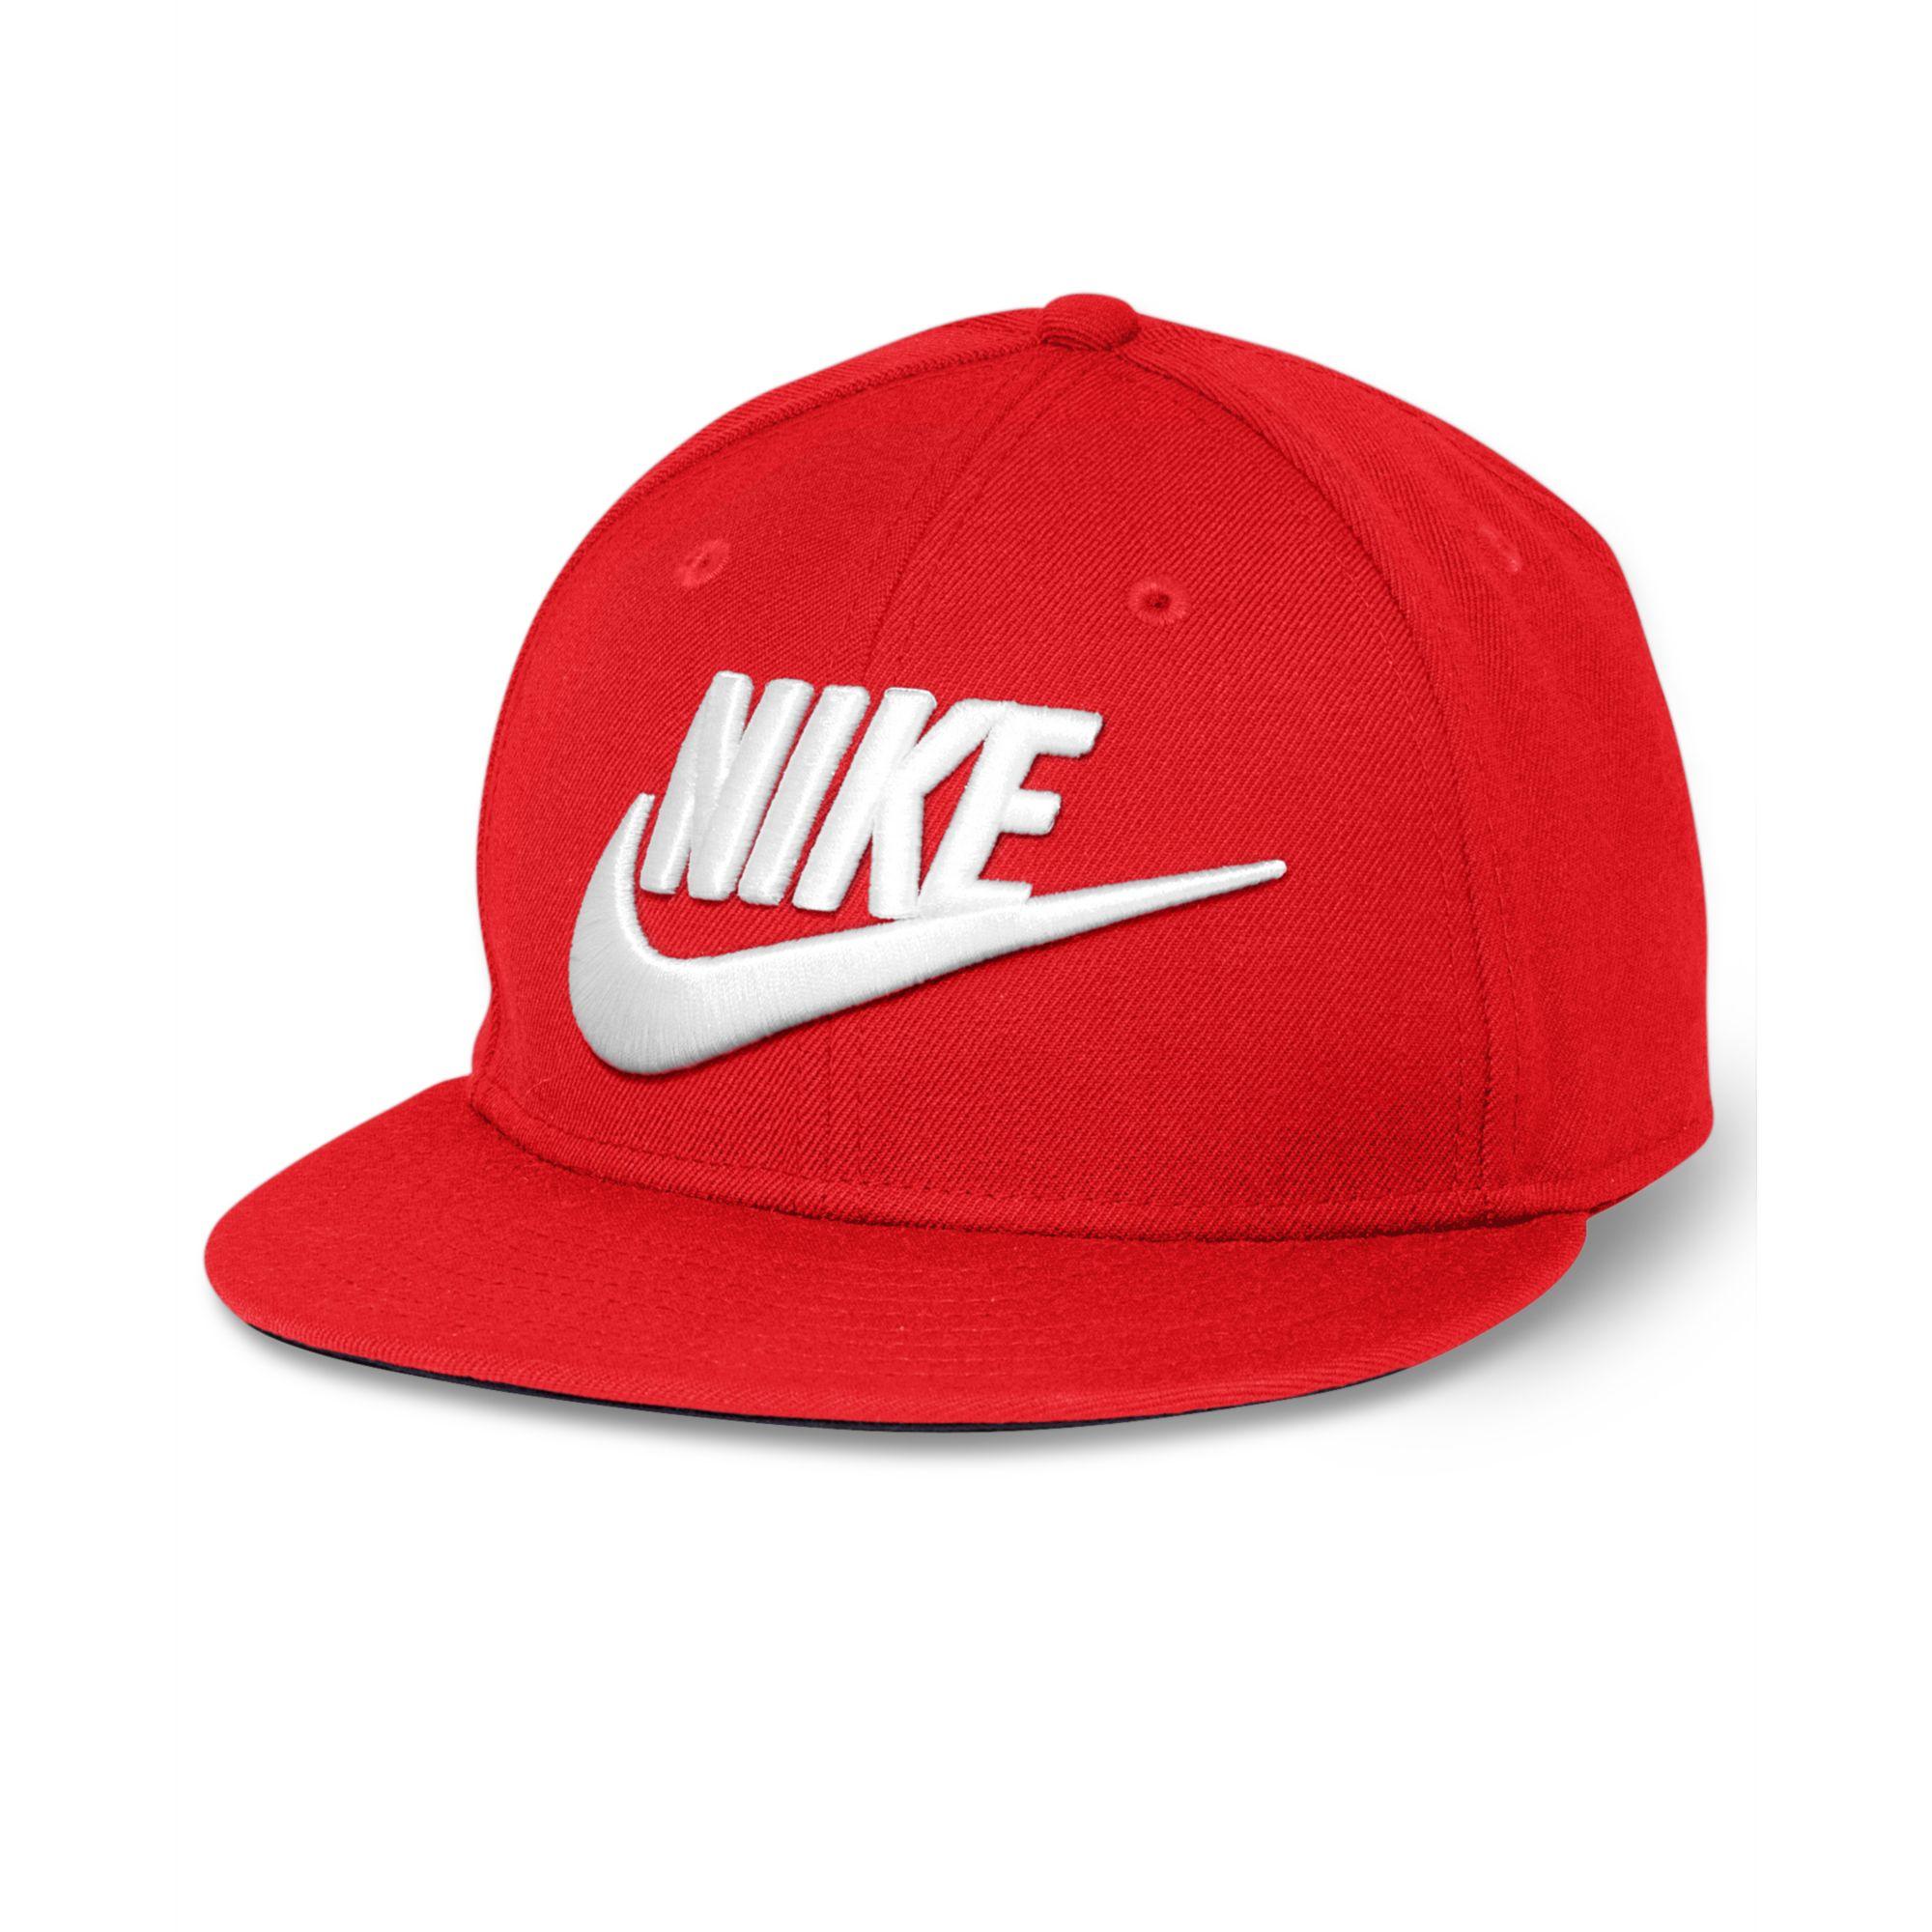 7c28f6a2e Nike Red Futura True Snapback Cap for men